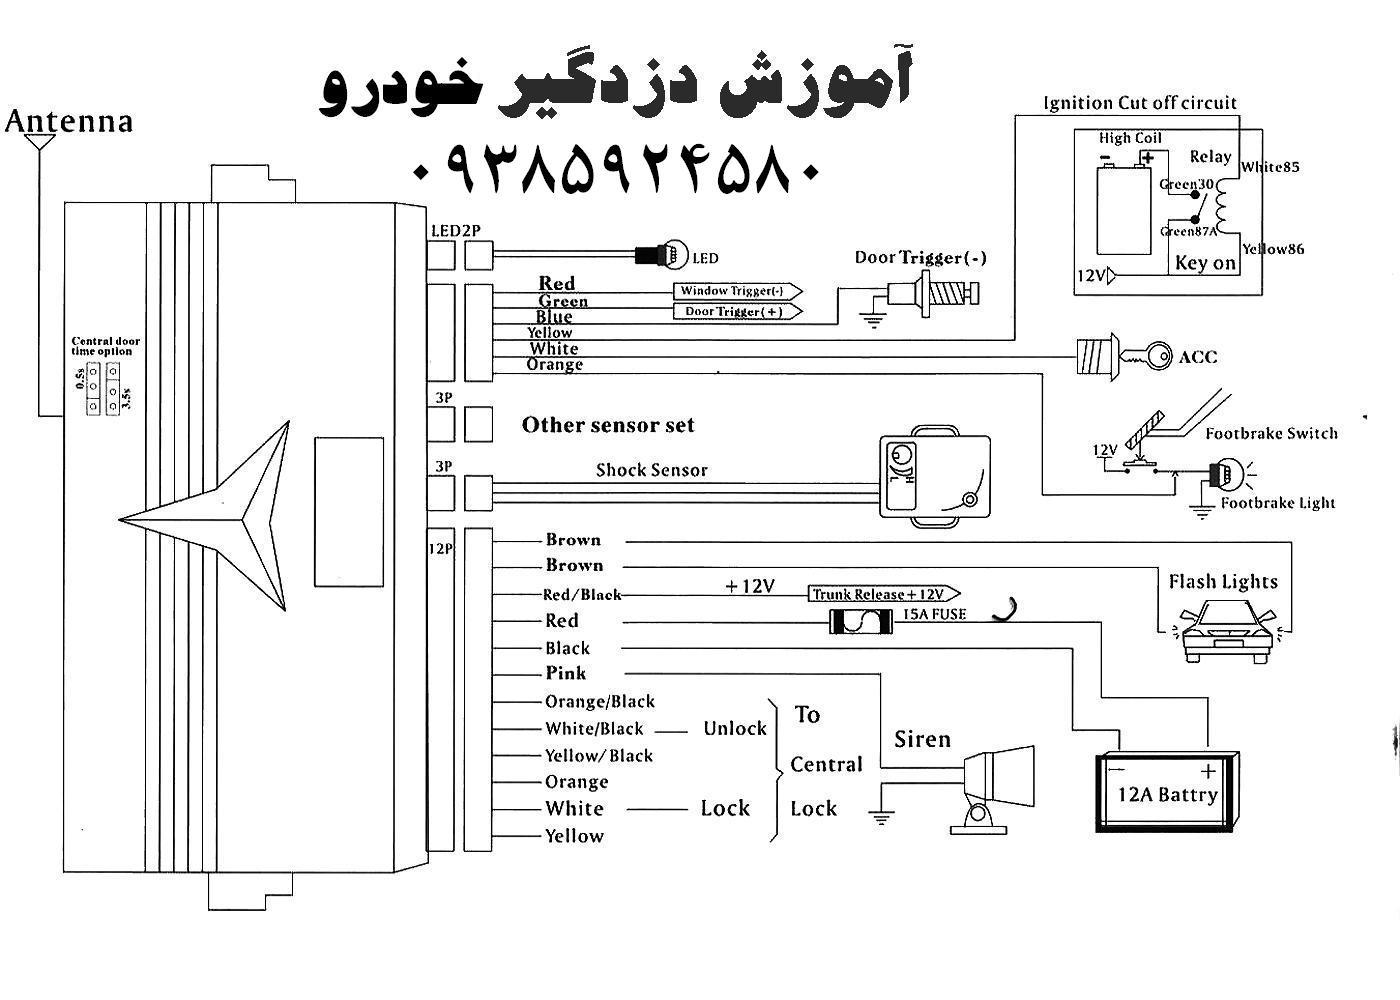 car alarm map (10) 100 [ wiring diagram for hkc alarm ] remote keypad ireland hkc hkc sensor wiring diagram at fashall.co